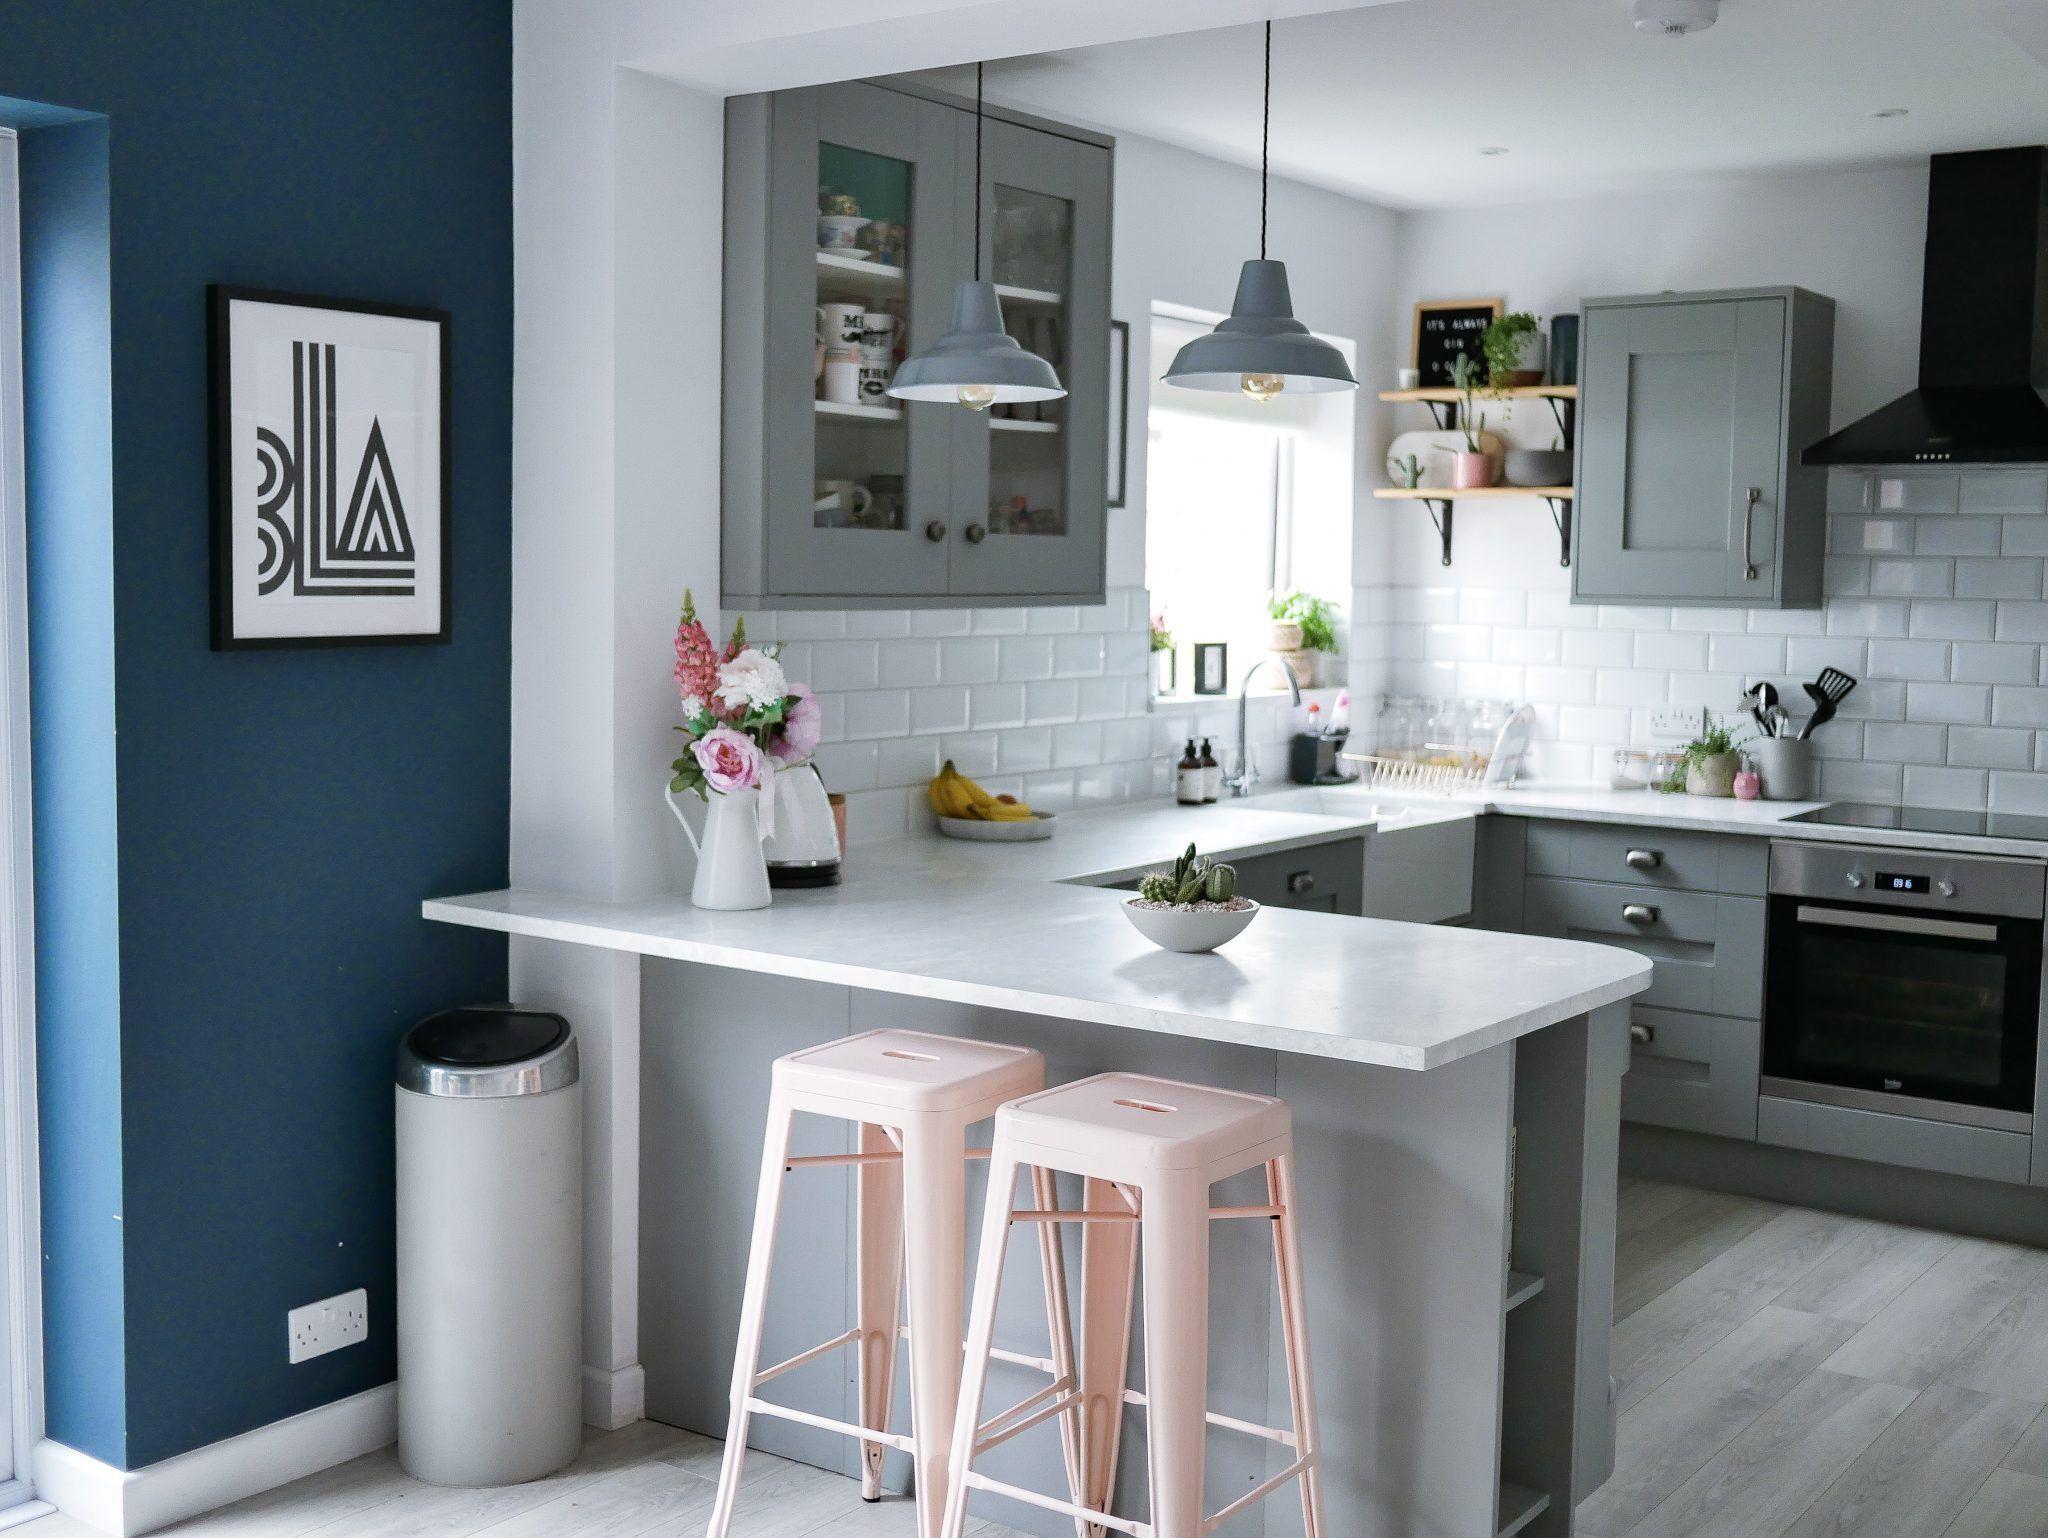 Best Our Kitchen Dining Room Renovation Grey Kitchen Walls 640 x 480